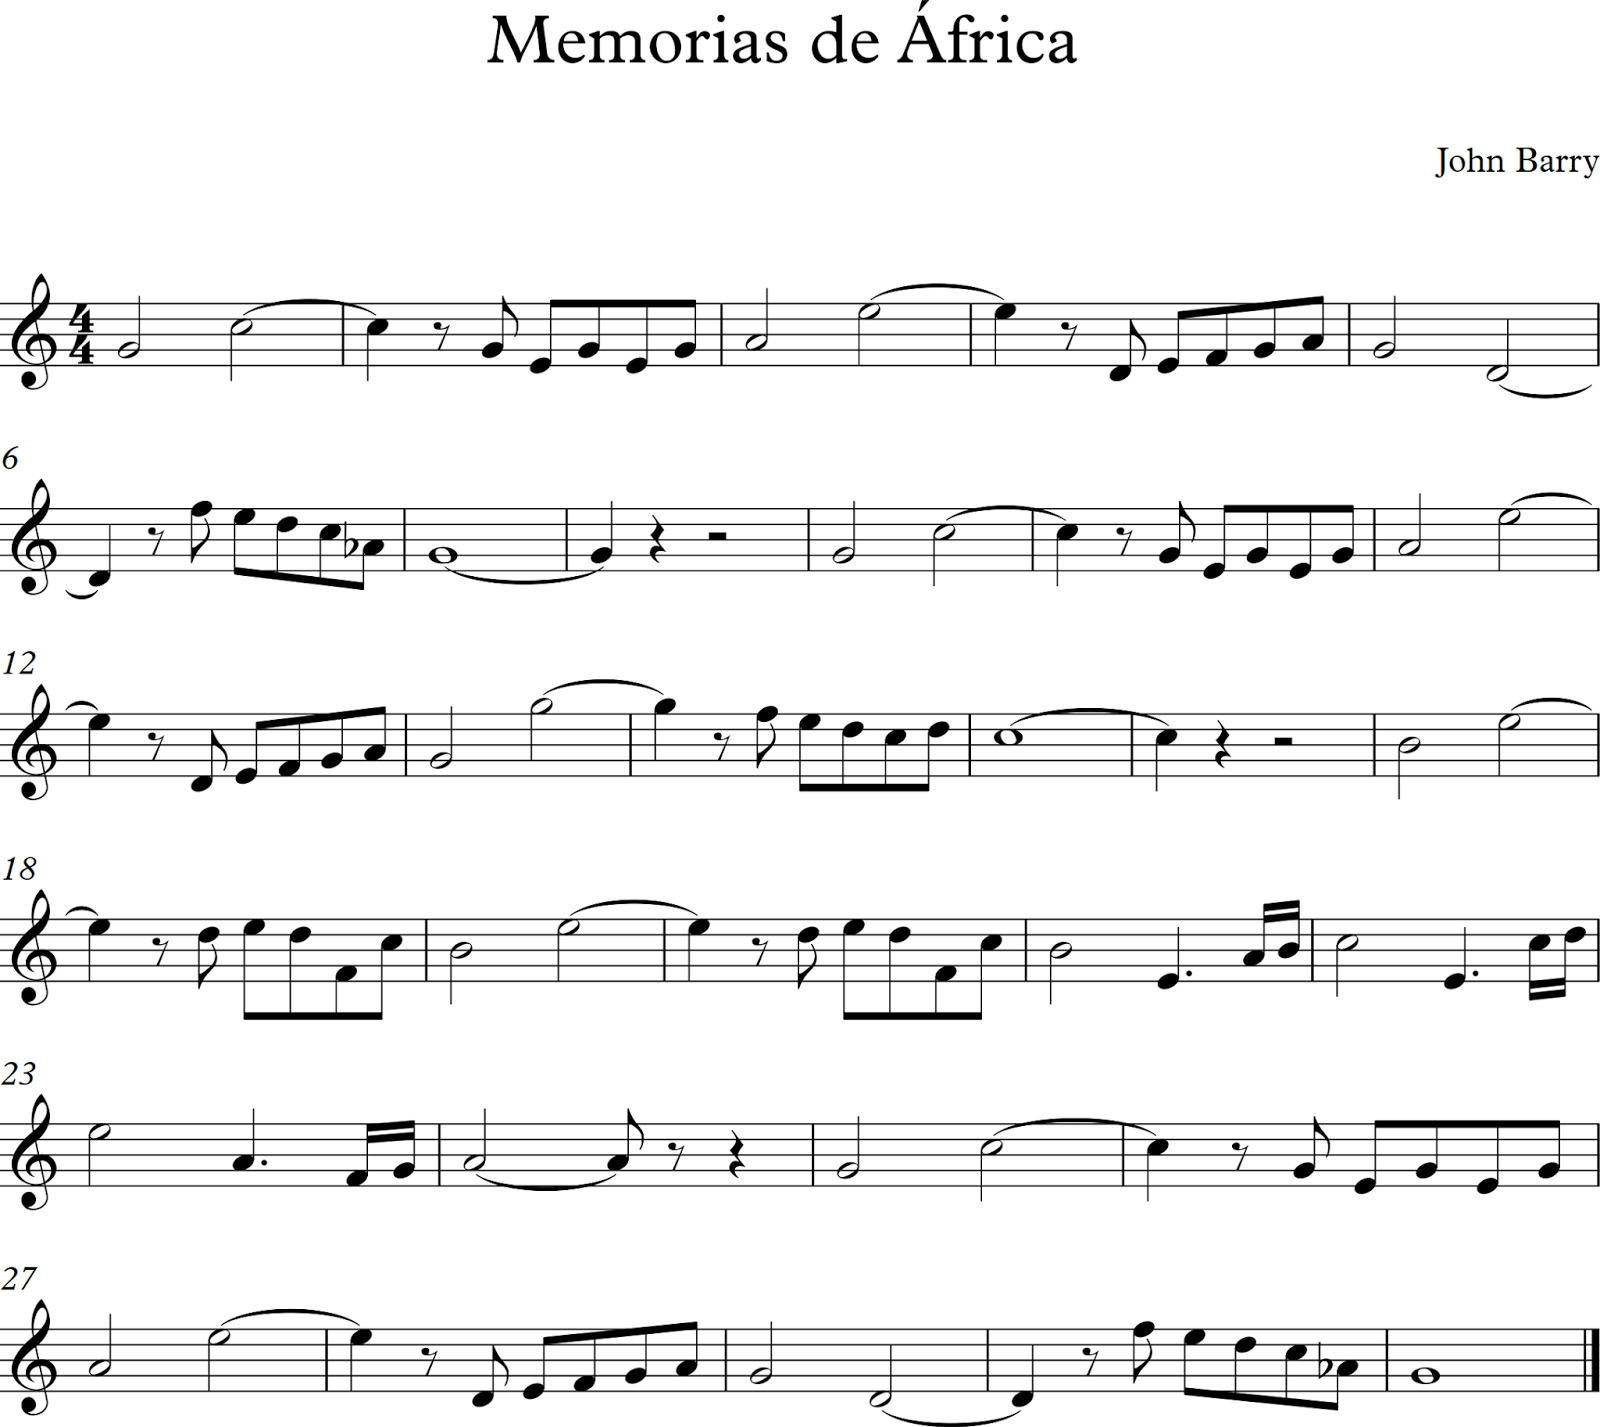 Descubriendo la m sica partituras para flauta dulce o de for Piani casa africani gratis